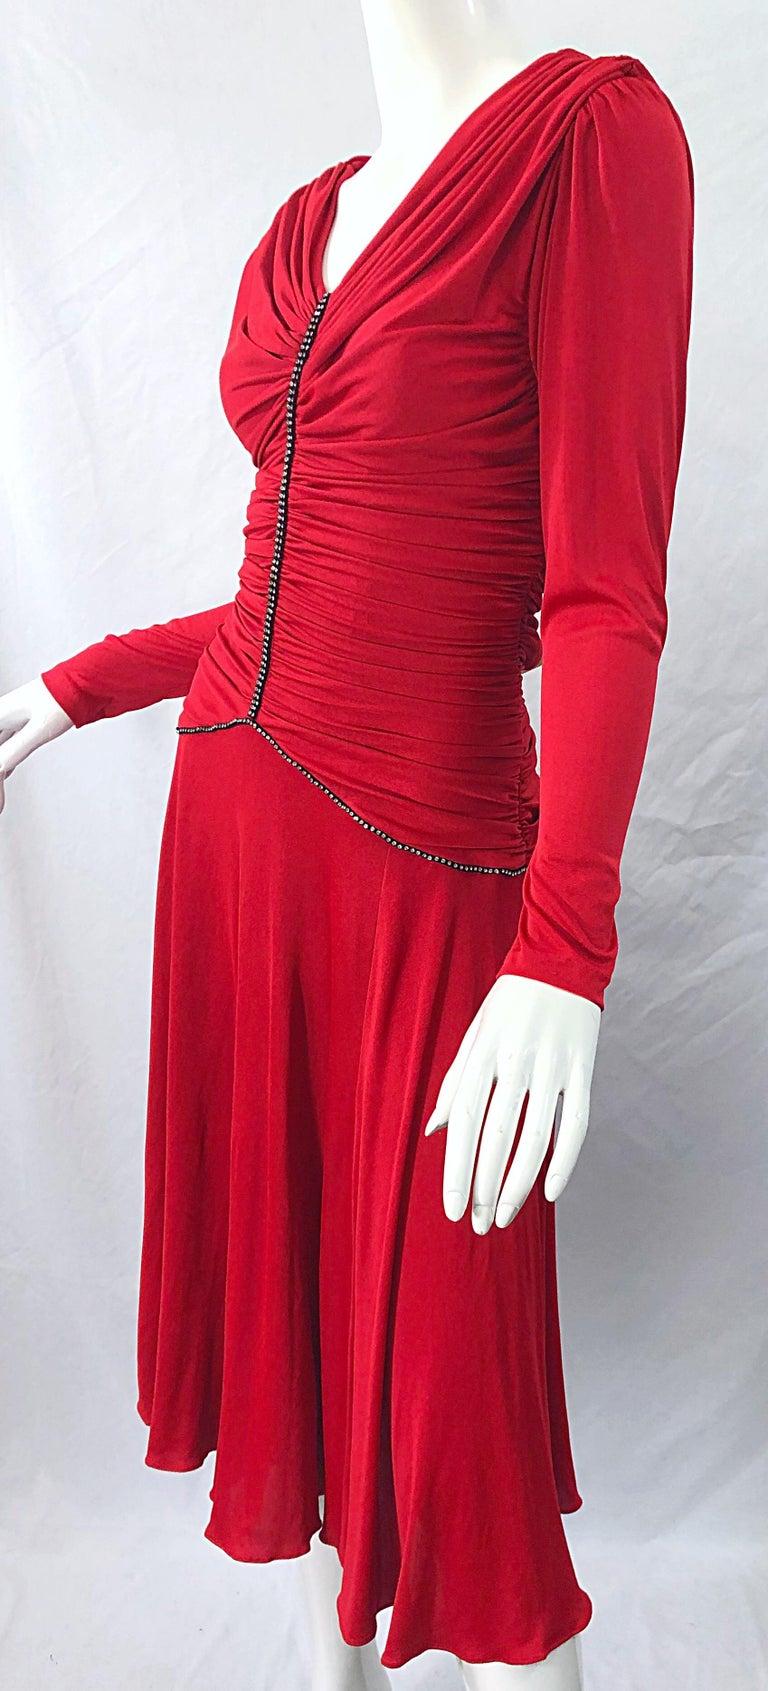 1970s Claraluna Original Lipstick Red Rhinestone Slinky Jersey Vintage 70s Dress For Sale 5